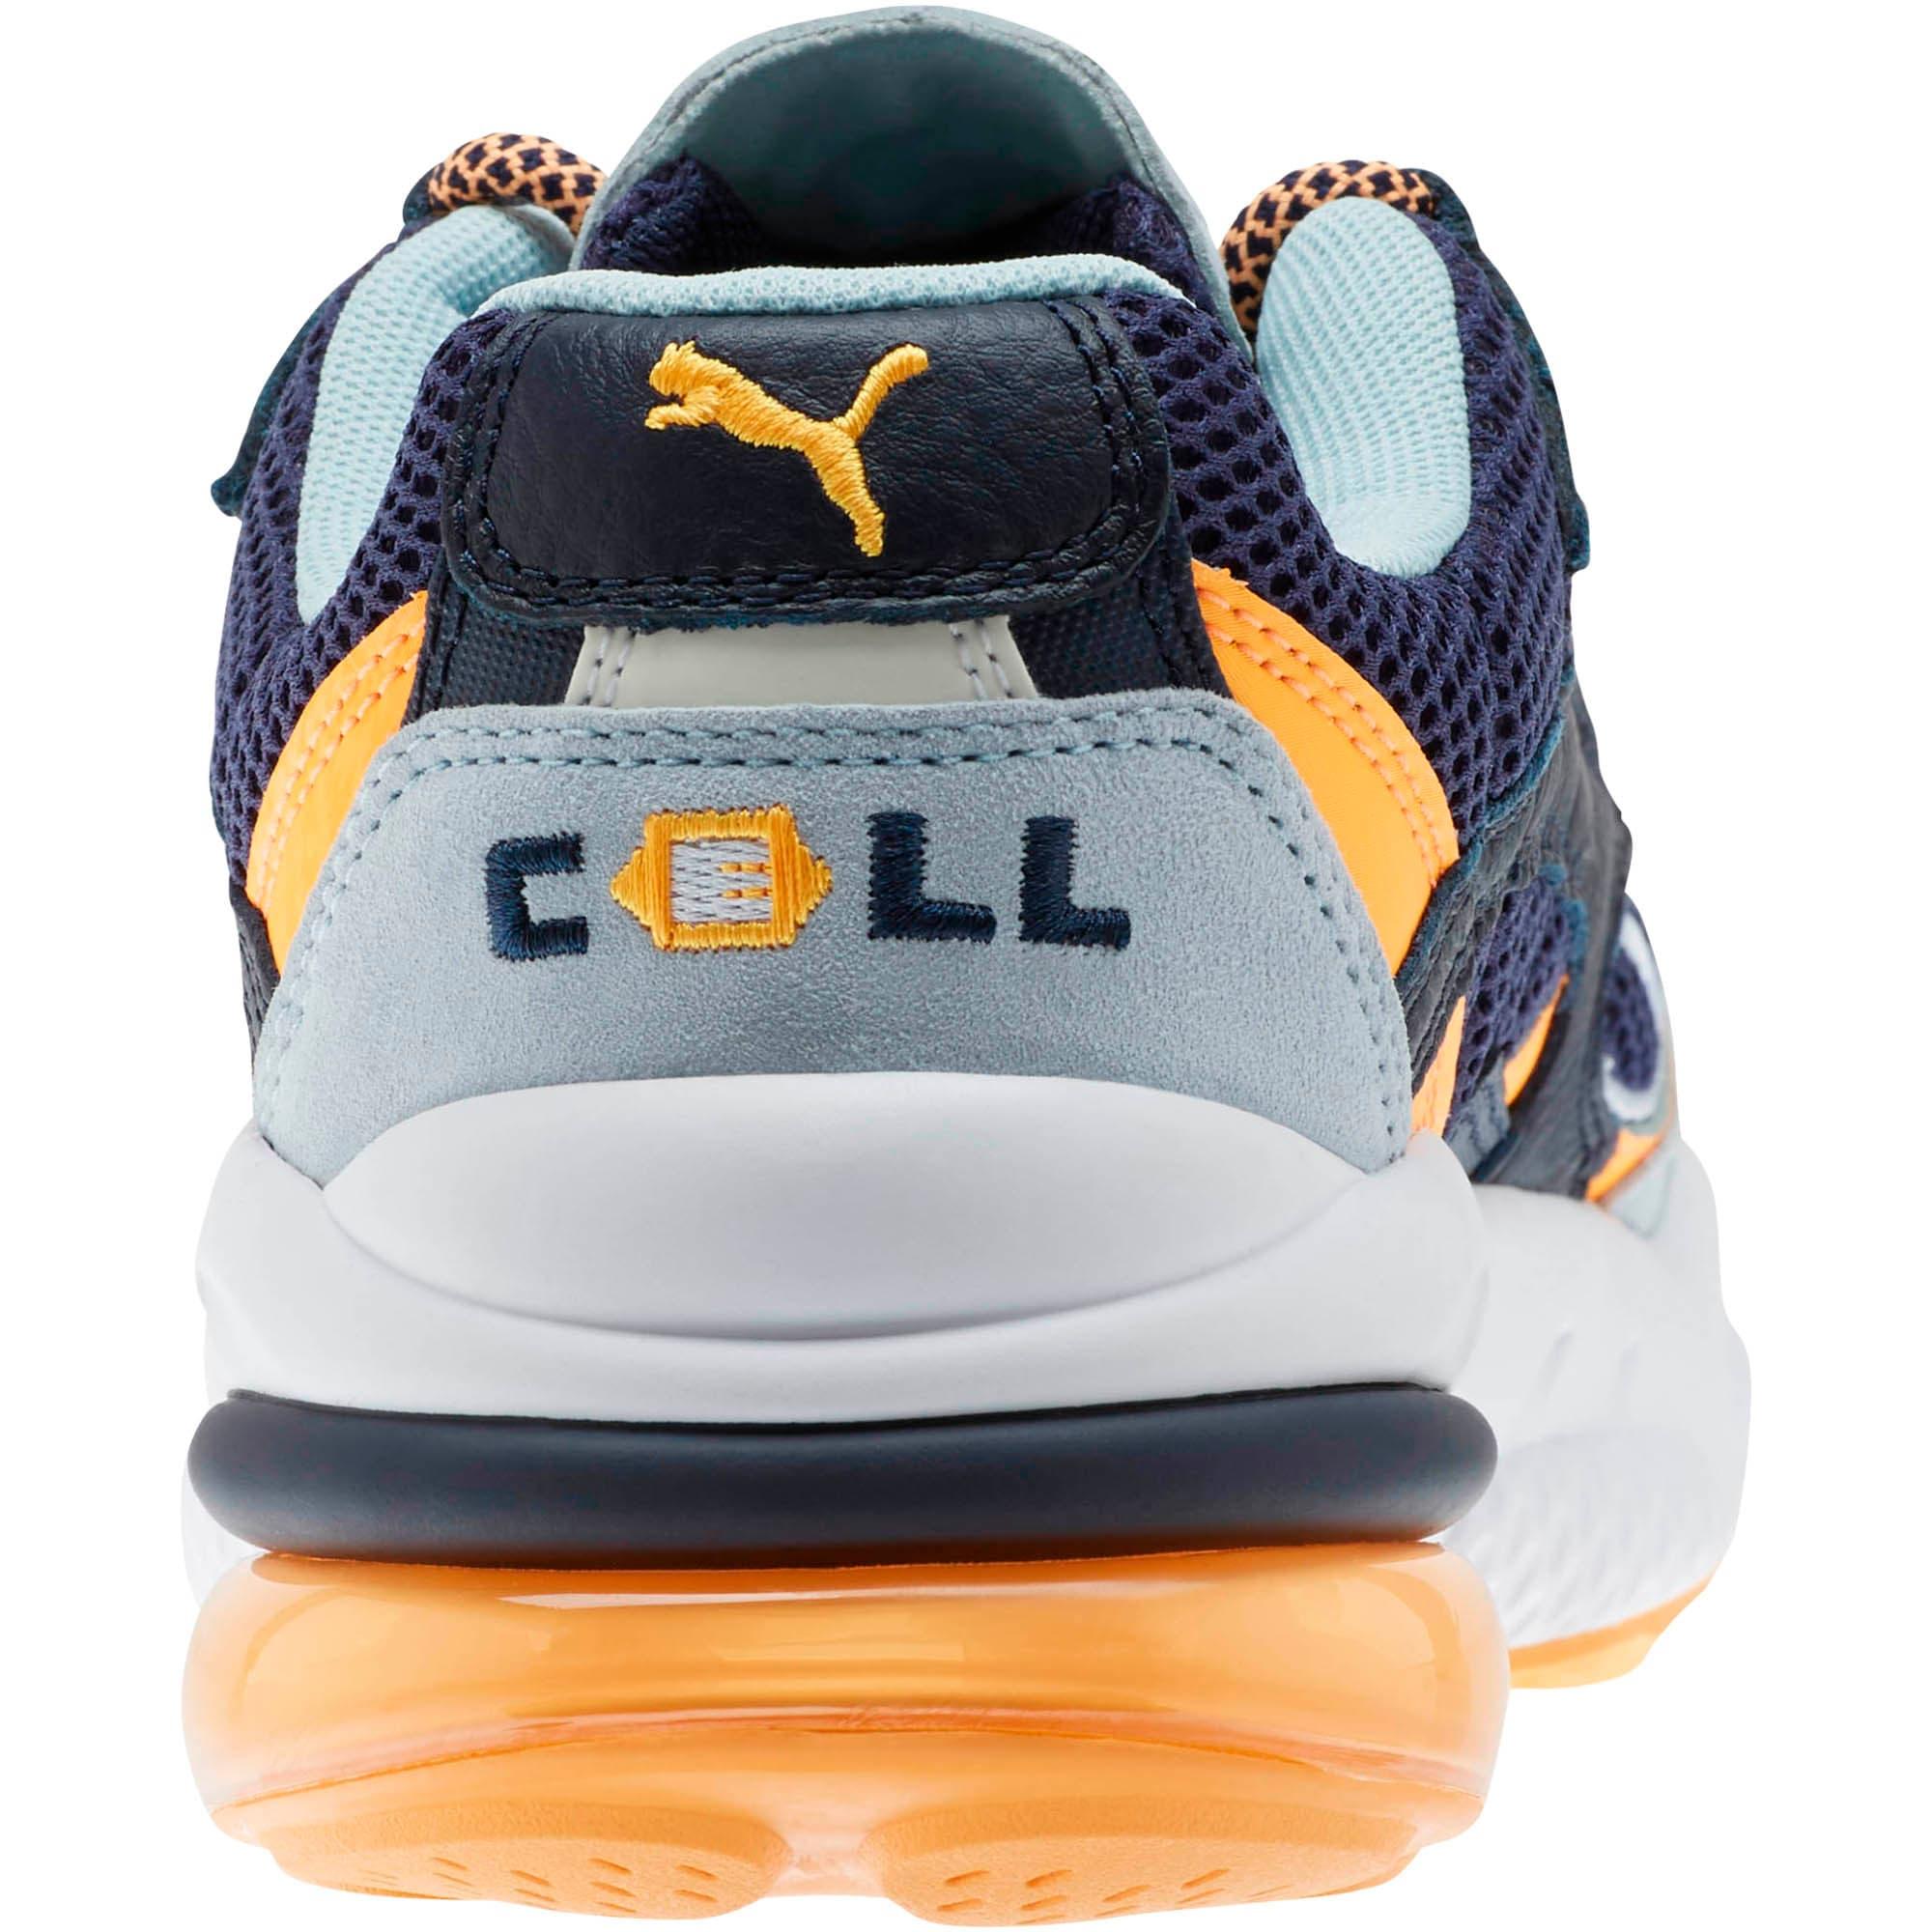 Thumbnail 3 of CELL Venom Sportswear Sneakers, Peacoat-Light Sky, medium